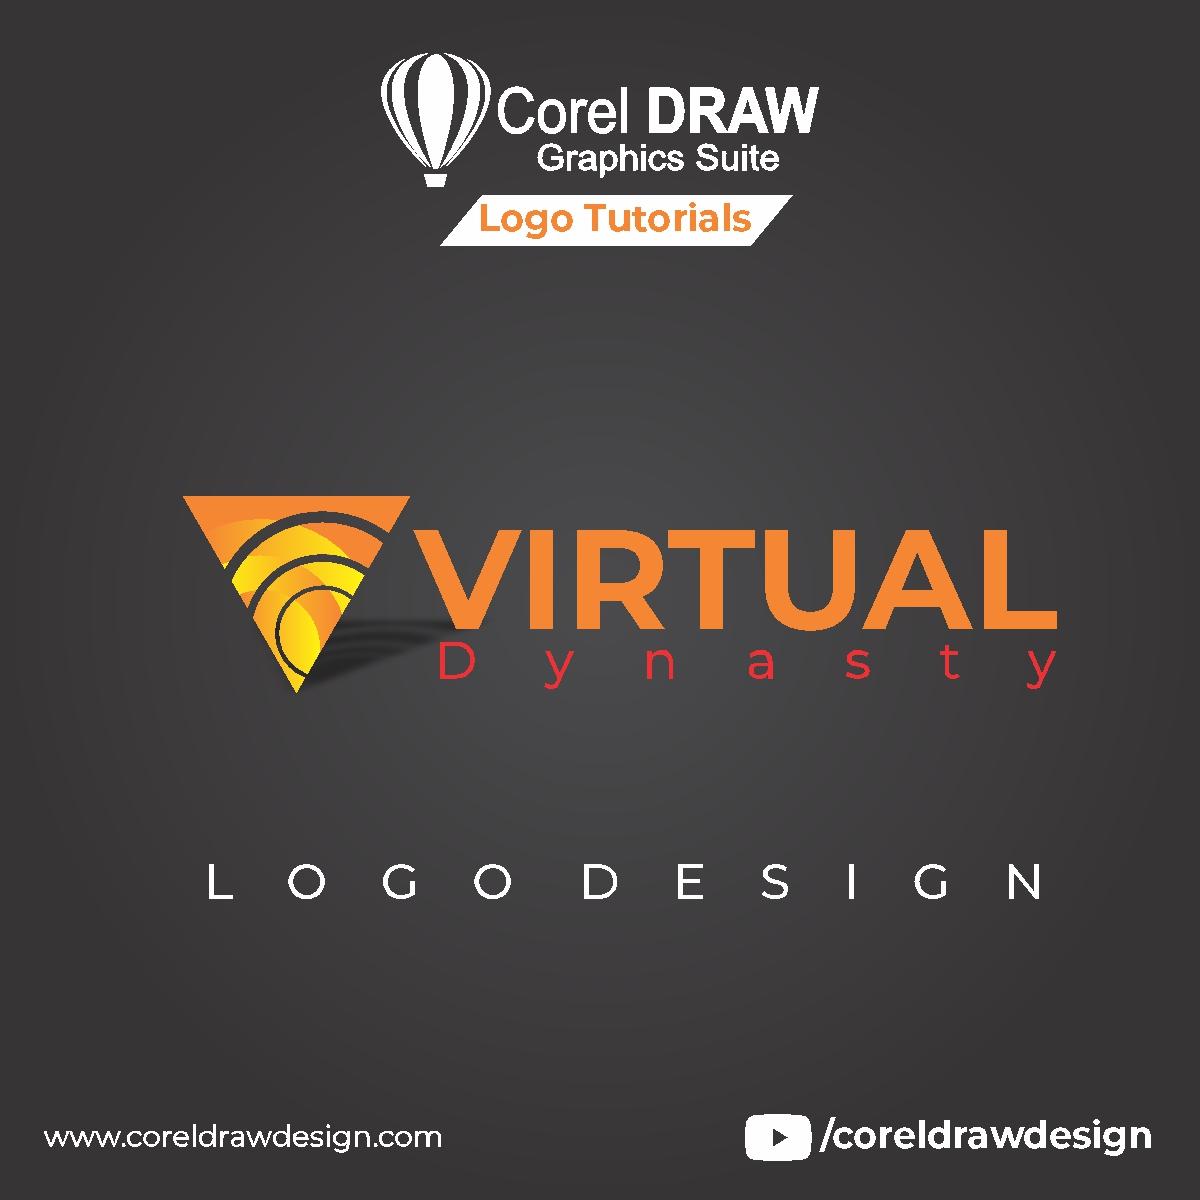 CorelDraw V Logo Tutorial, V Logo Design Digital Graphics Tutorial Coreldraw for Beginners